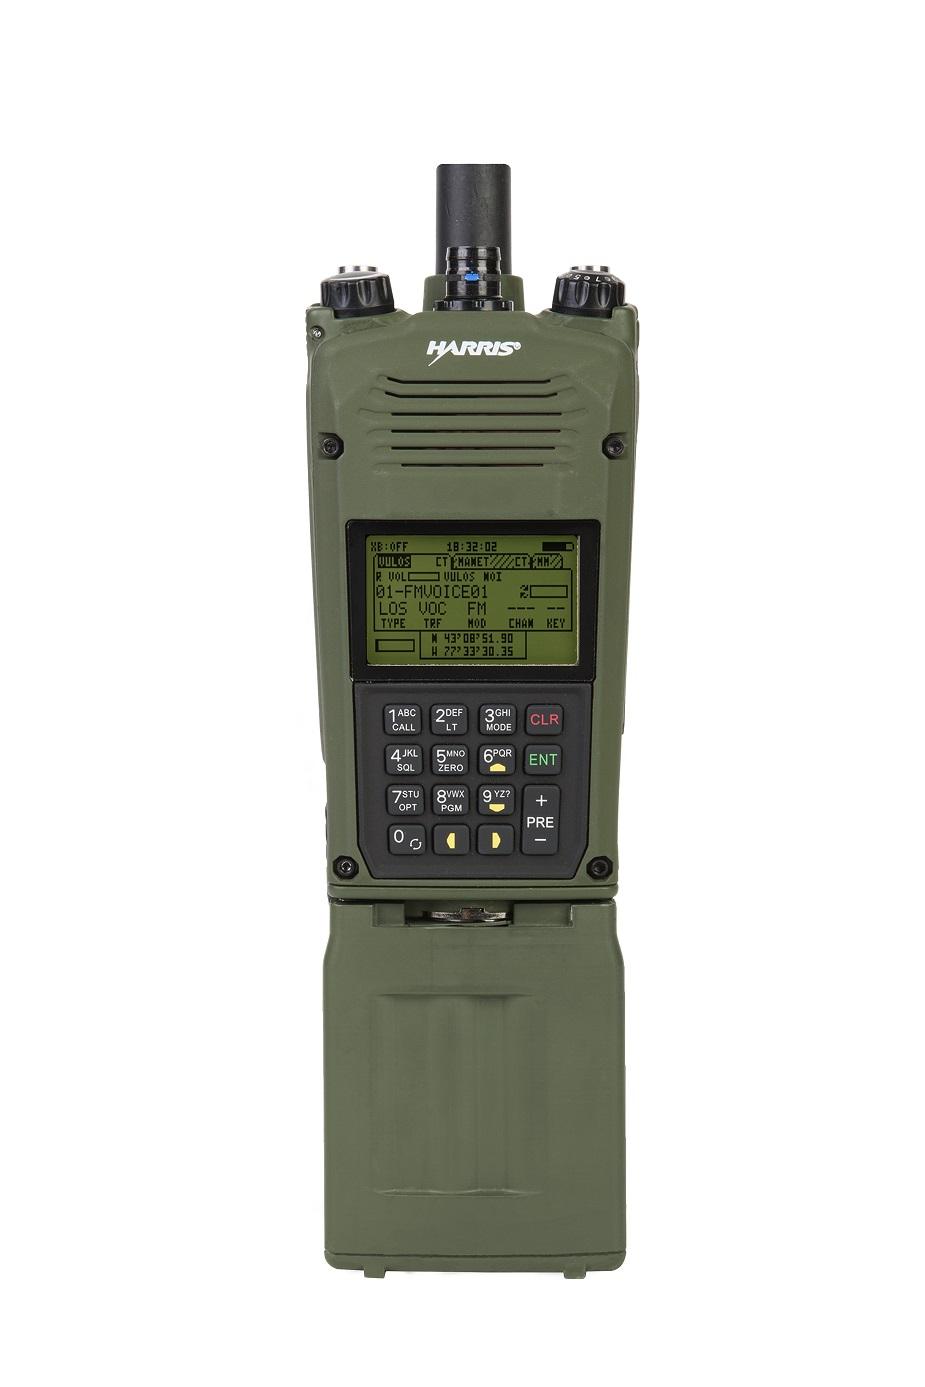 harris_corporation_an_prc_163_radio_nsa_type1_certification.jpg